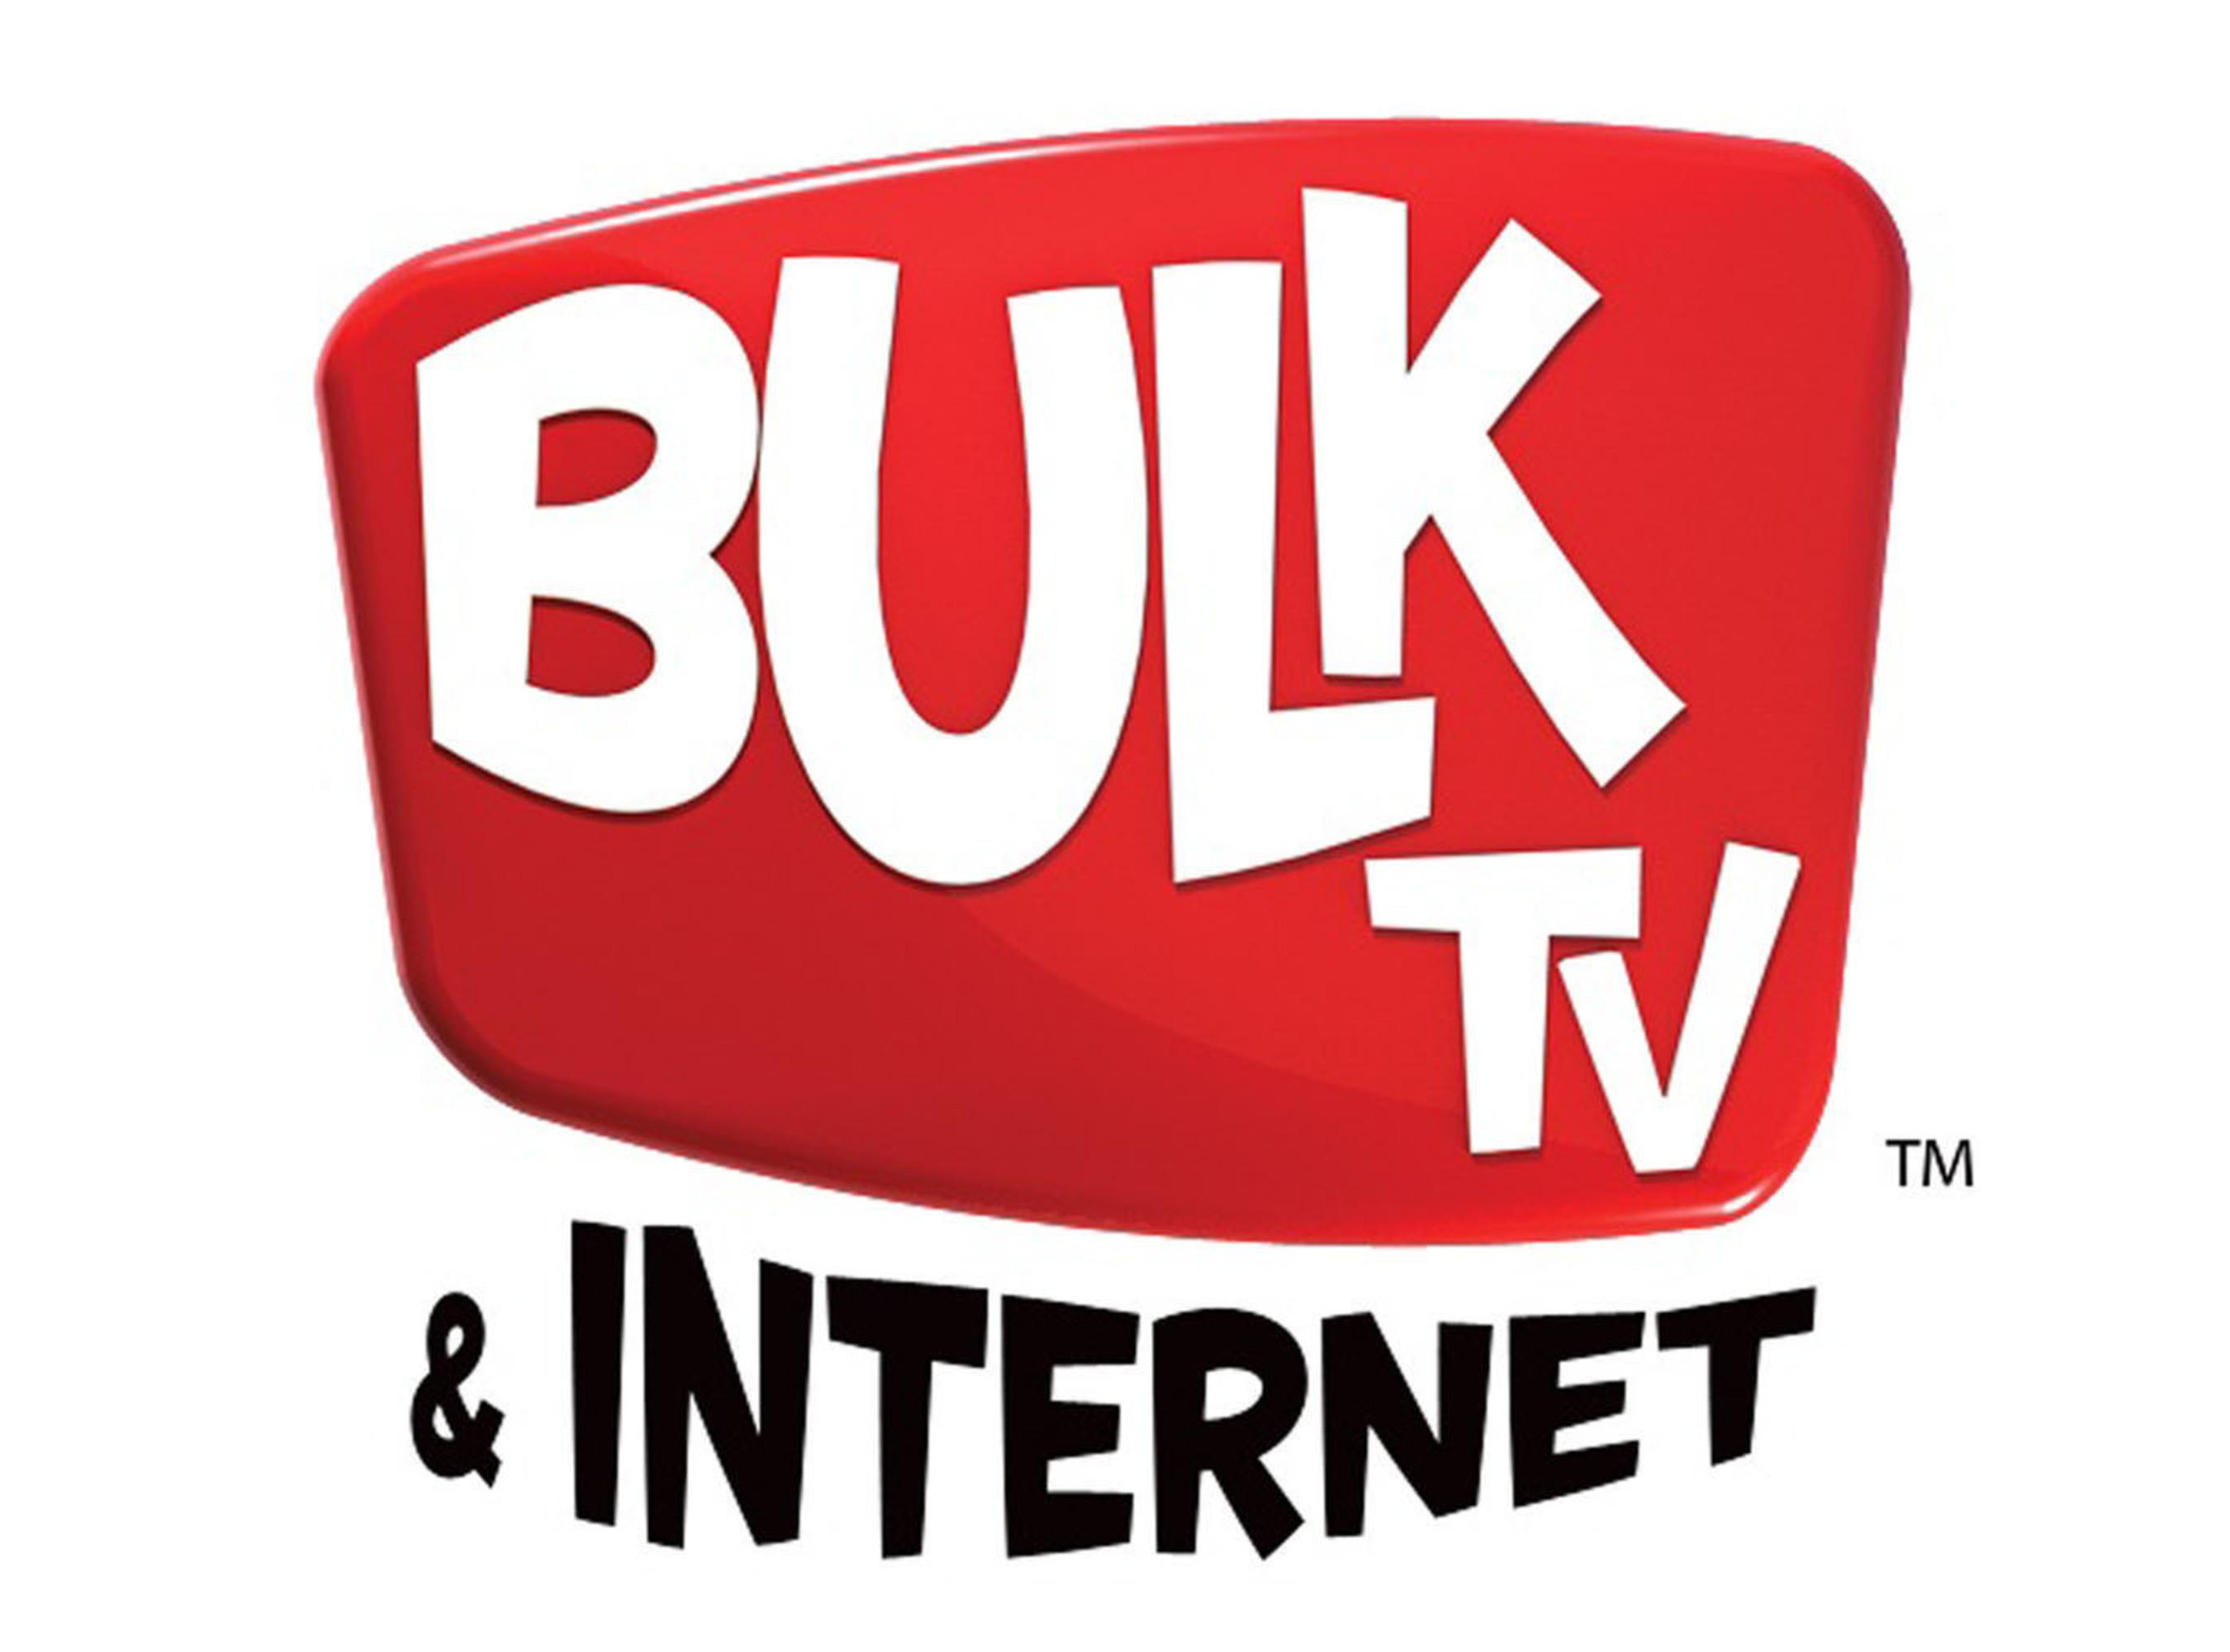 Bulk TV & Internet provides free-to-guest television services to businesses nationwide. (PRNewsFoto/Bulk TV & Internet)